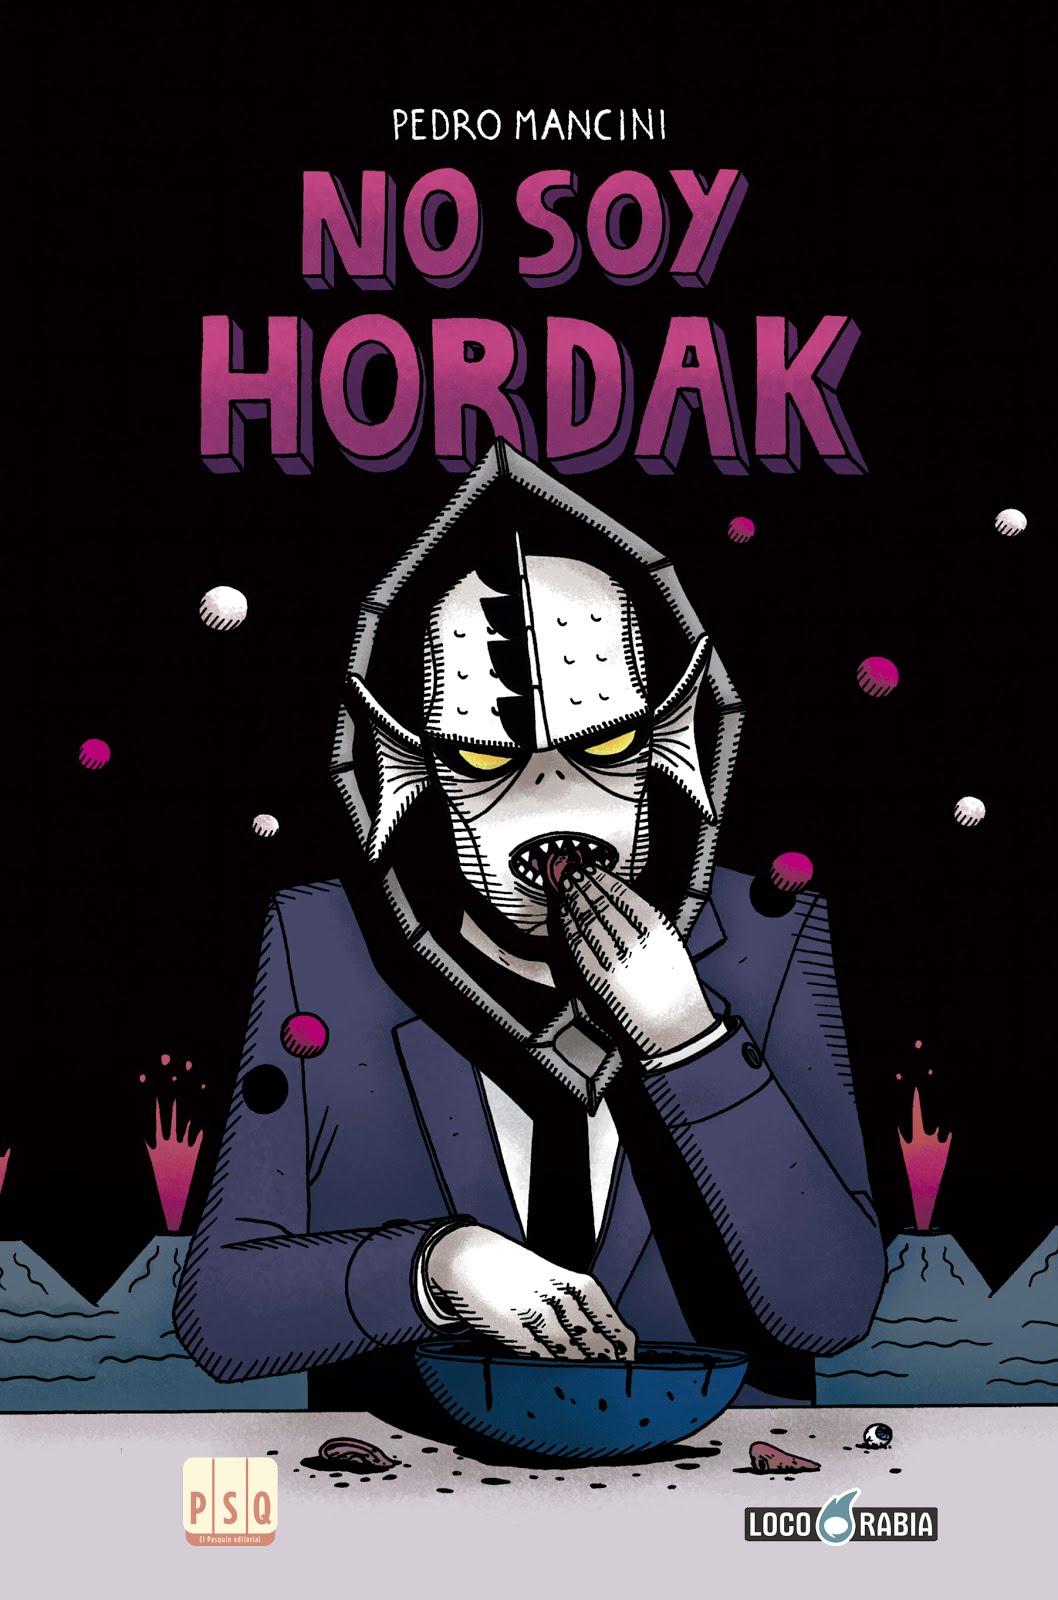 No soy Hordak